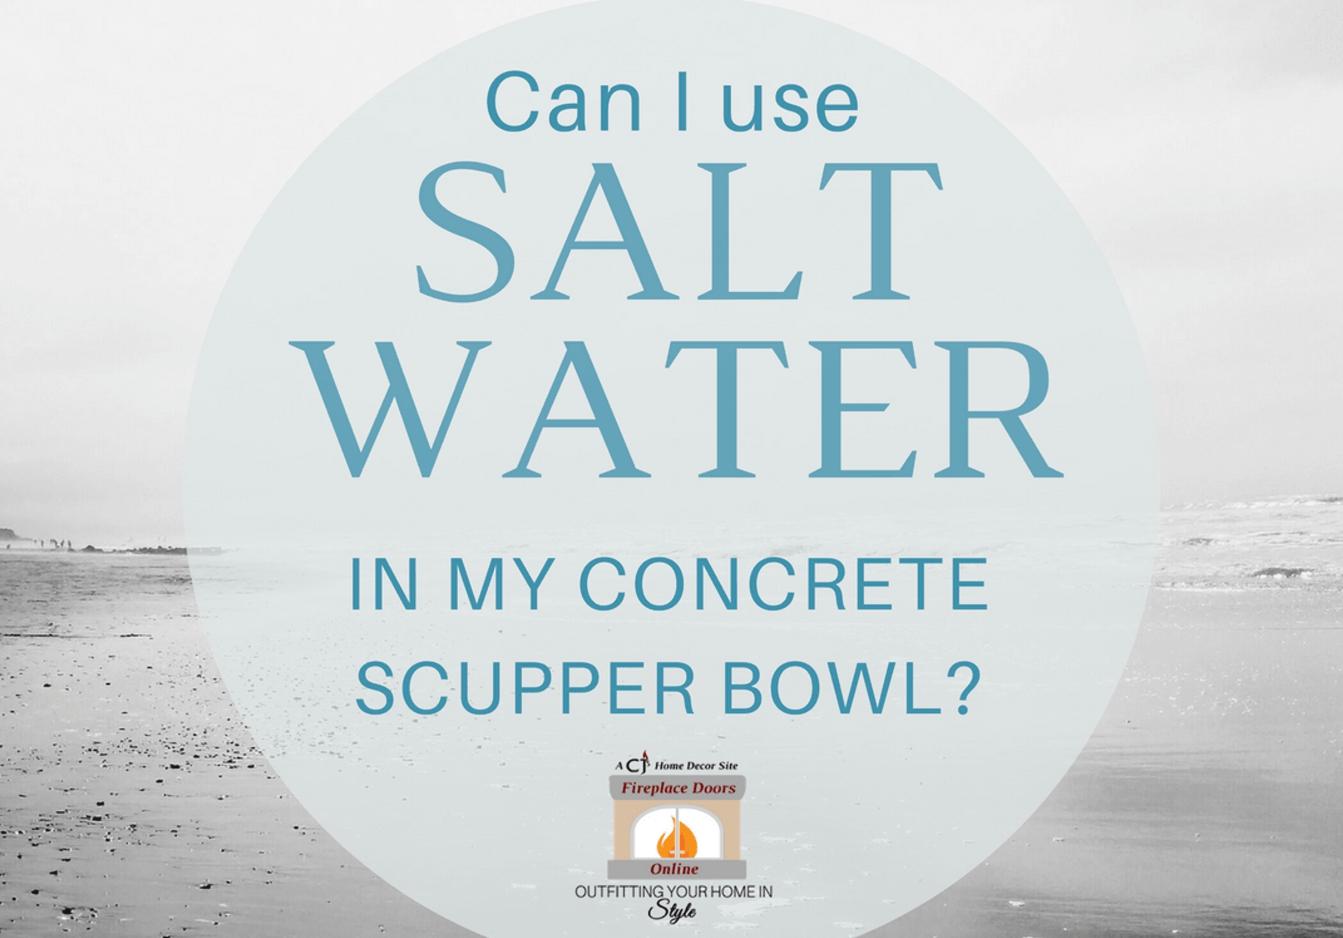 Salt Water in Concrete Bowls